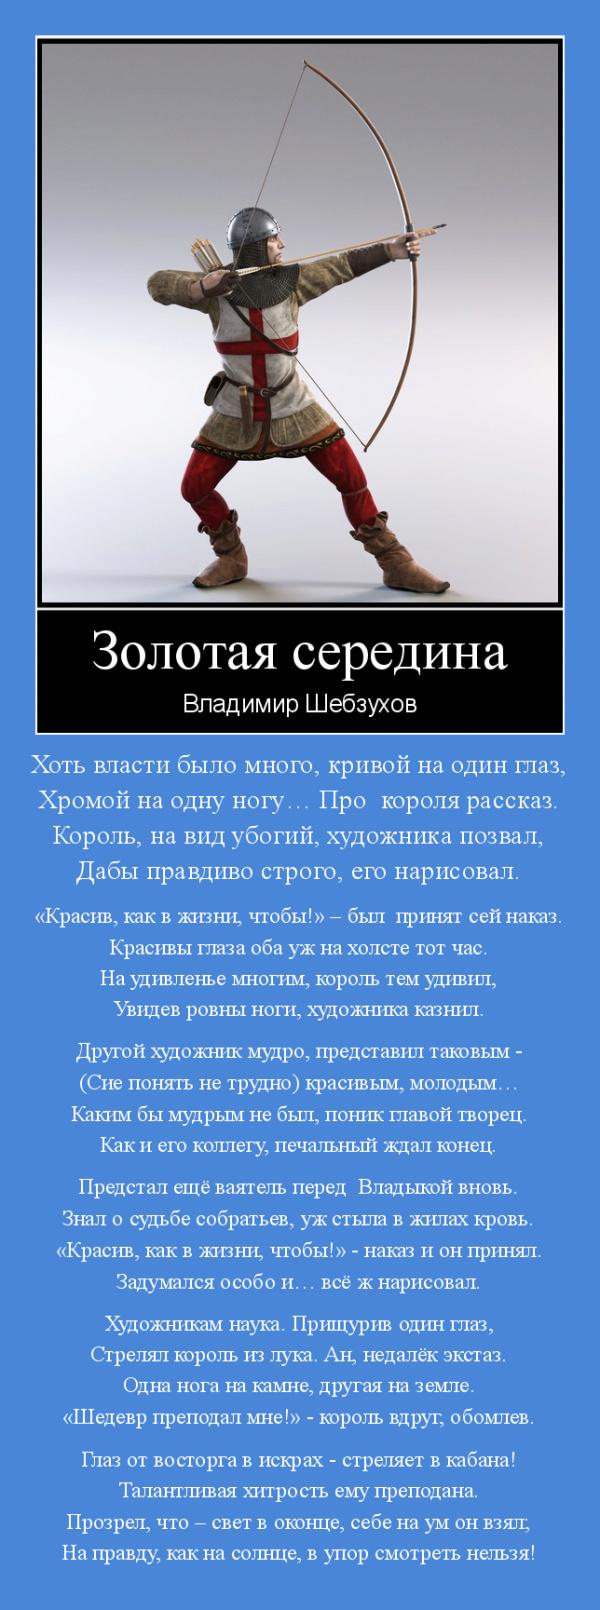 Владимир Шебзухов Притчи  - Страница 45 Ec_eze10